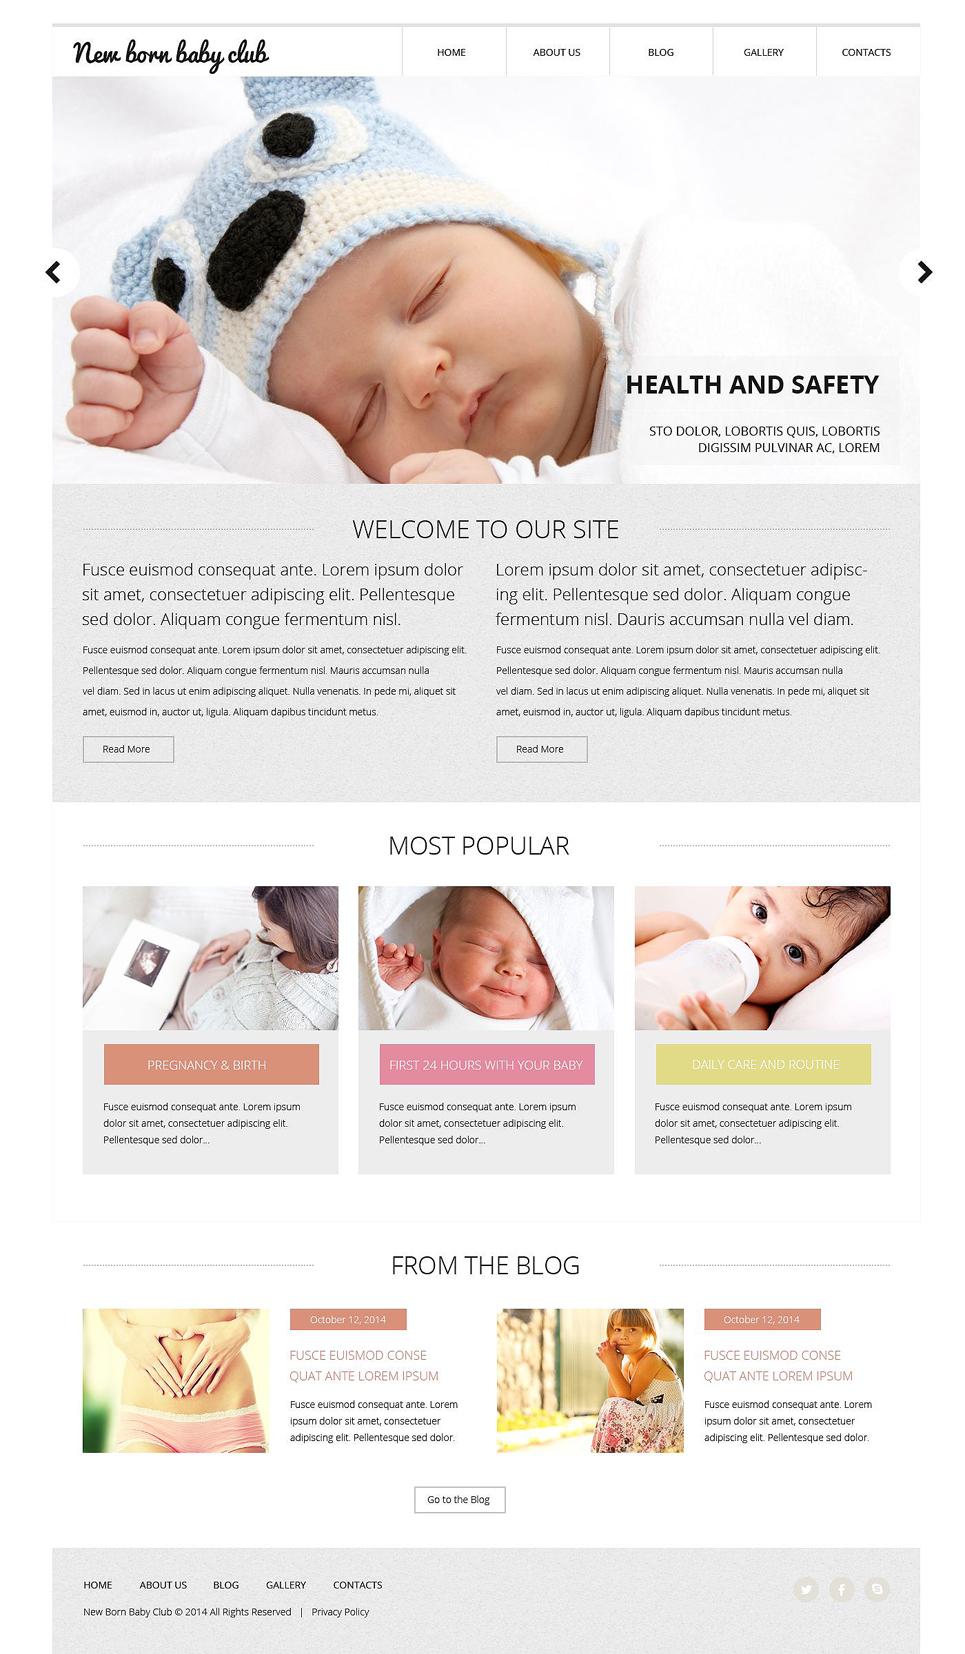 New Born Baby Club template illustration image